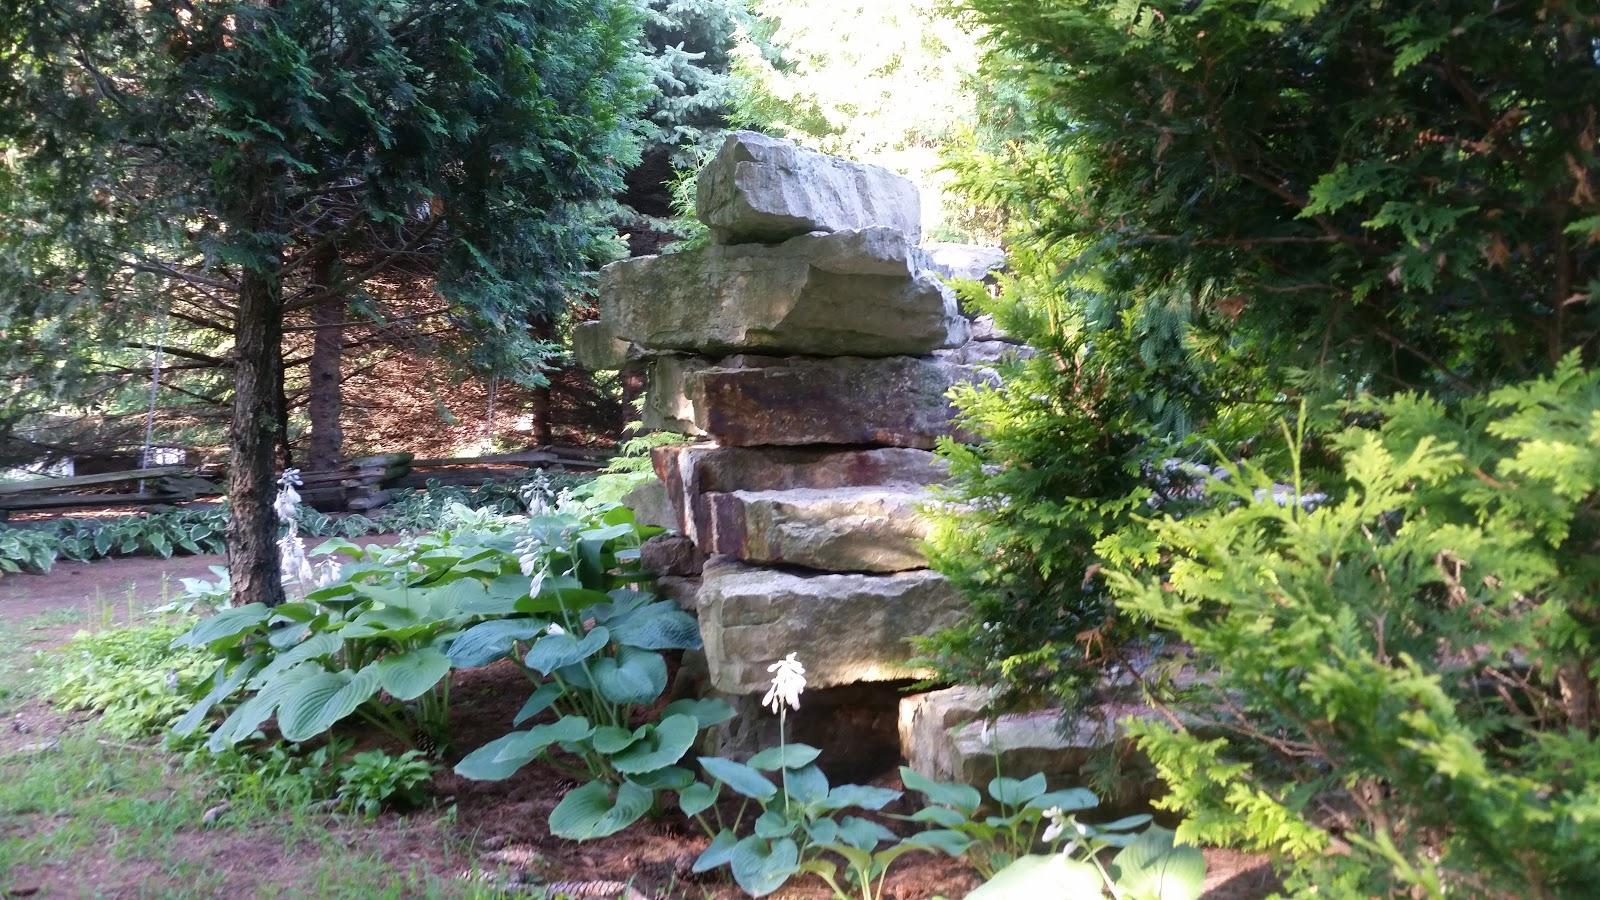 Quarry Shade Garden At Bon Air Park: Quarry Garden Stained Glass